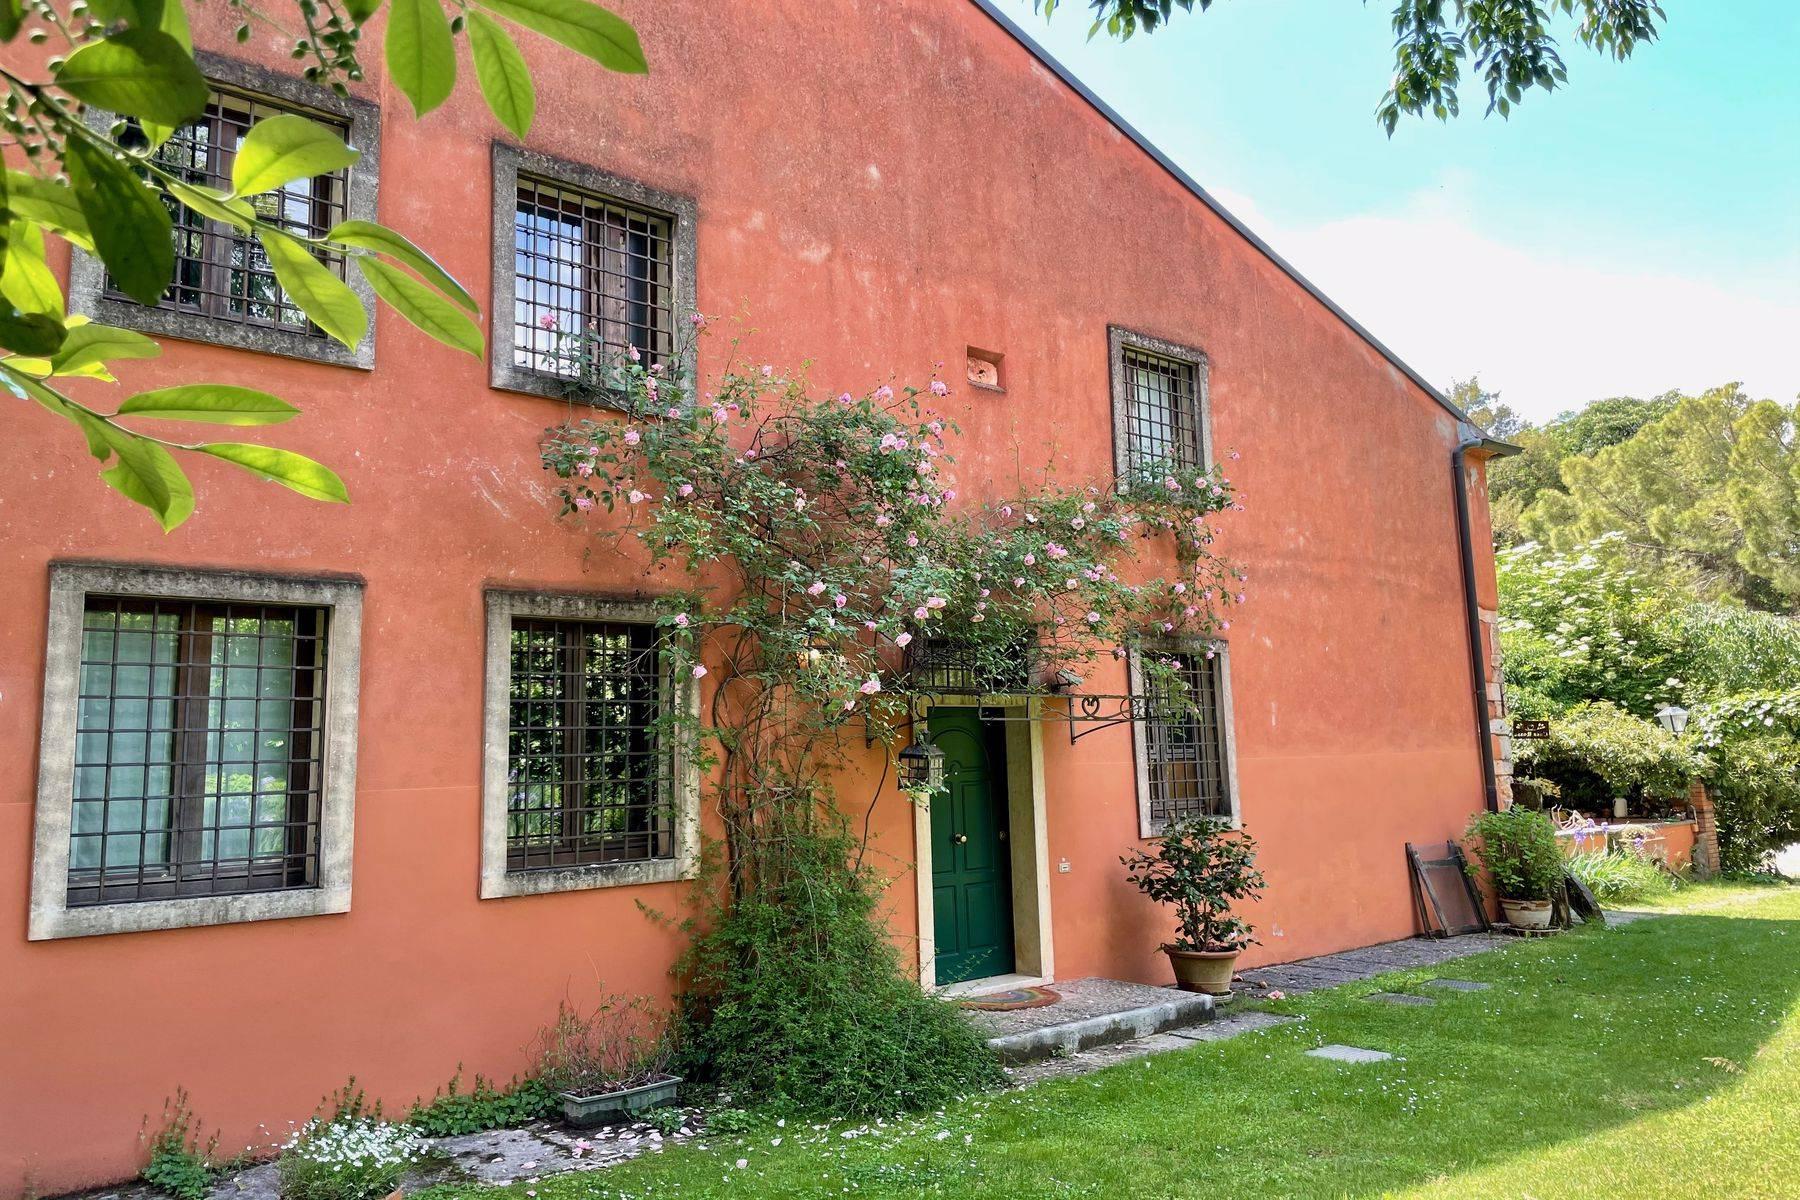 Rustico in Vendita a Verona: 5 locali, 350 mq - Foto 2